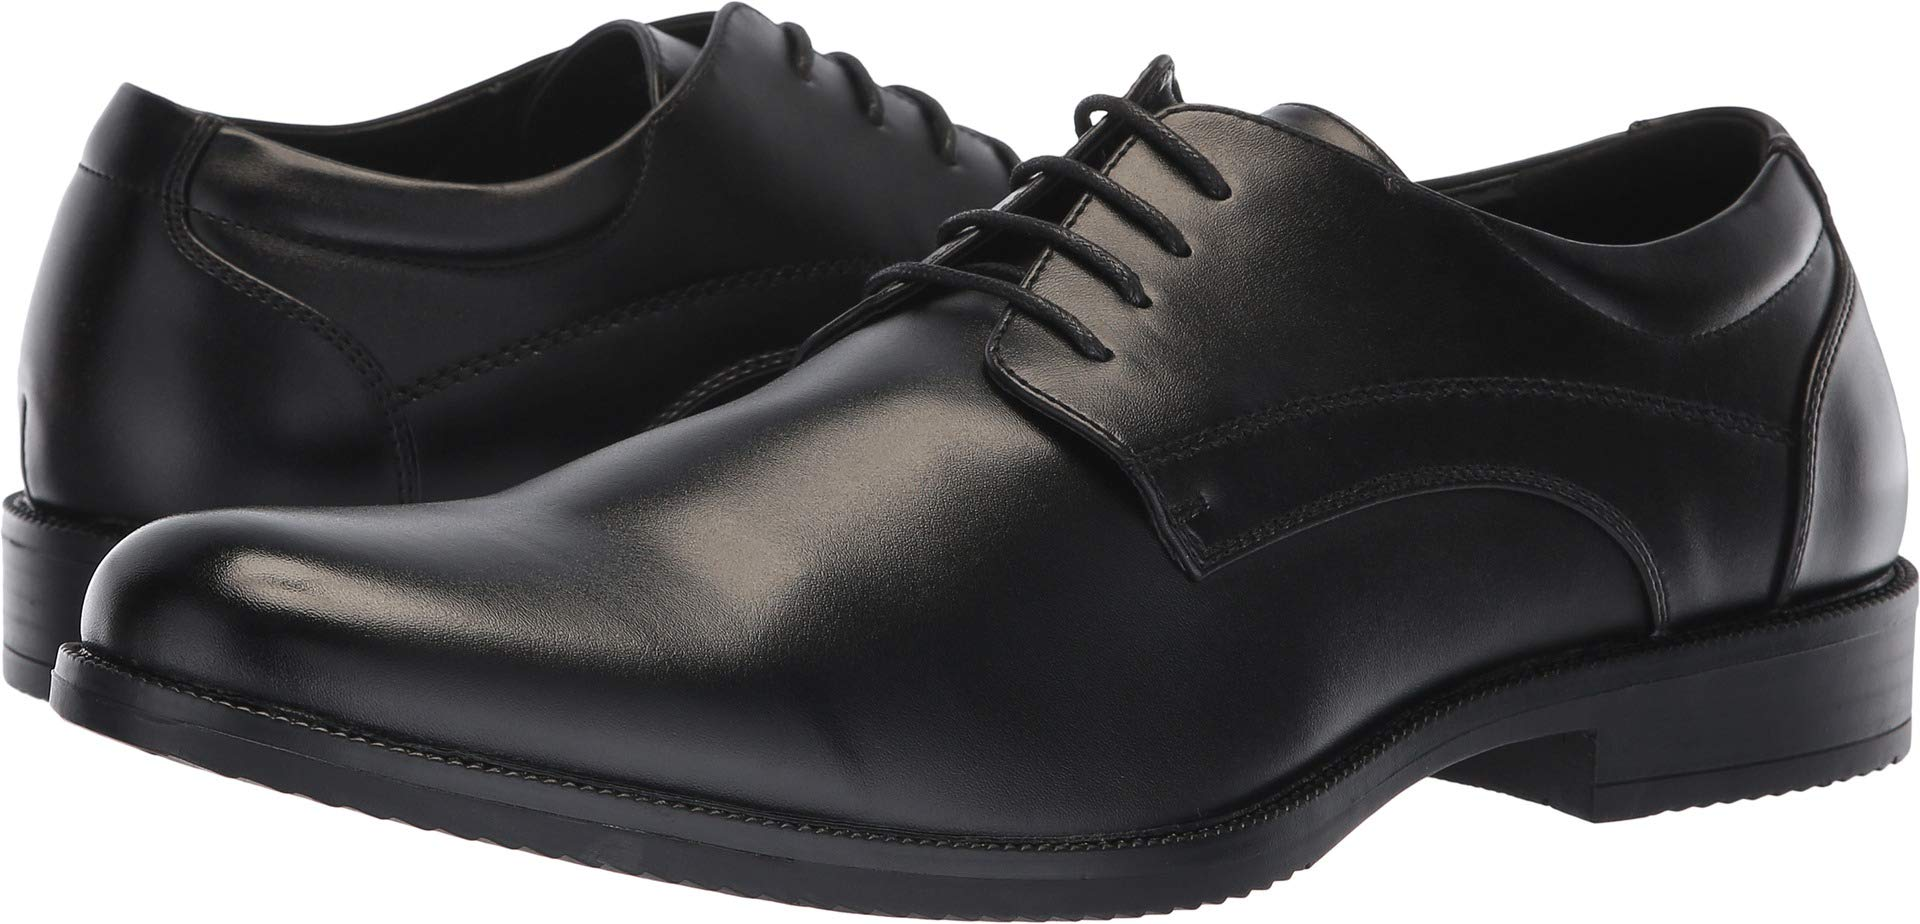 Van Heusen Men's Larry Black Oxford Dress Shoes